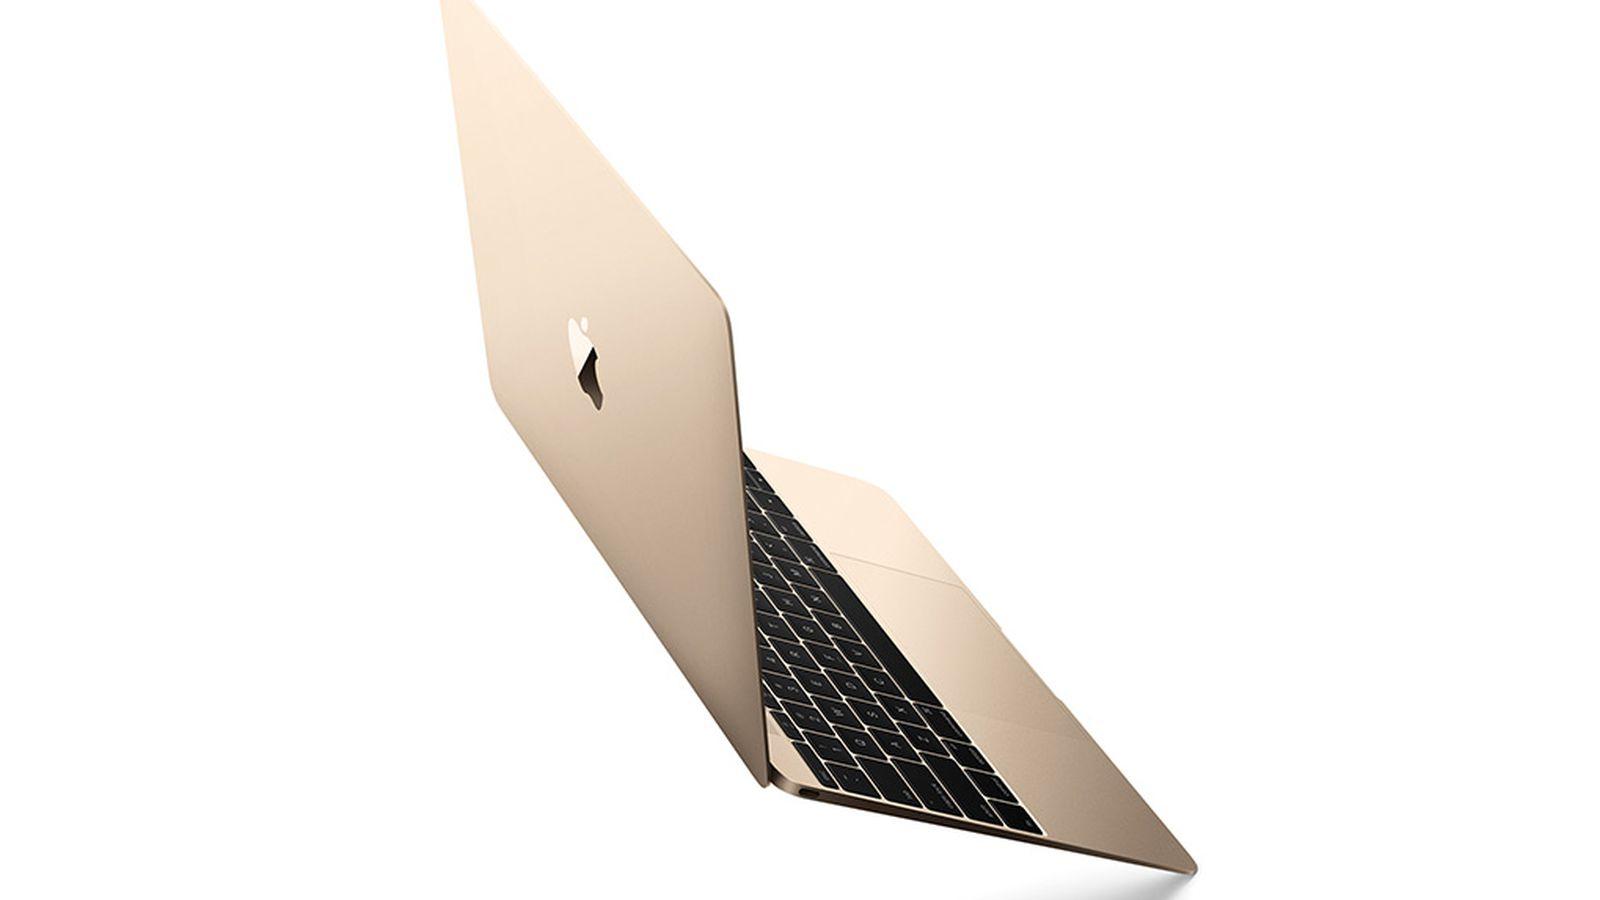 Apple macbook air 11 inches review : laptops, desktops